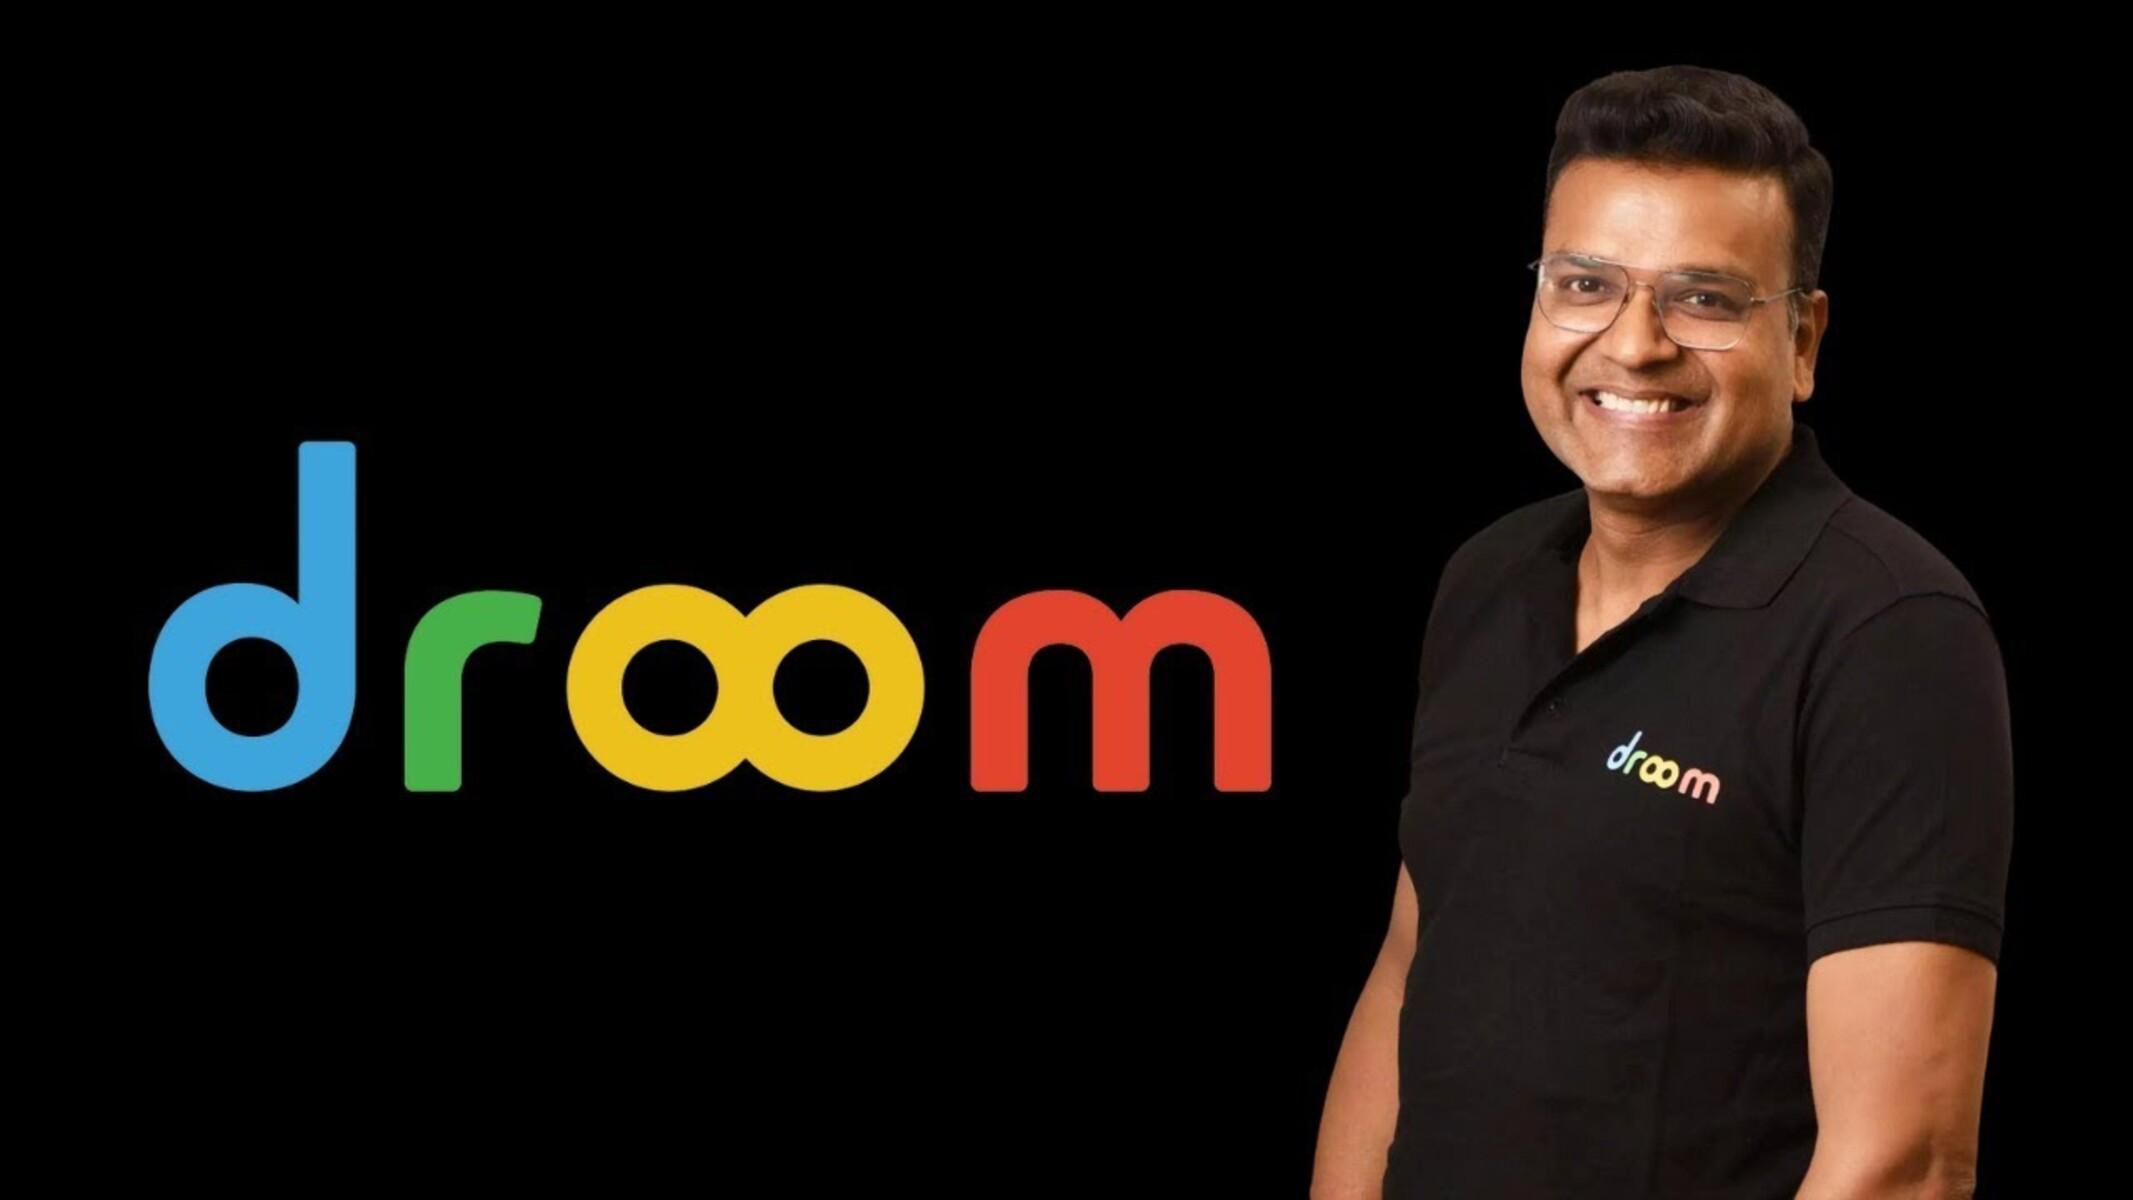 Droom logo along side Founder and CEO Sandeep Aggarwal